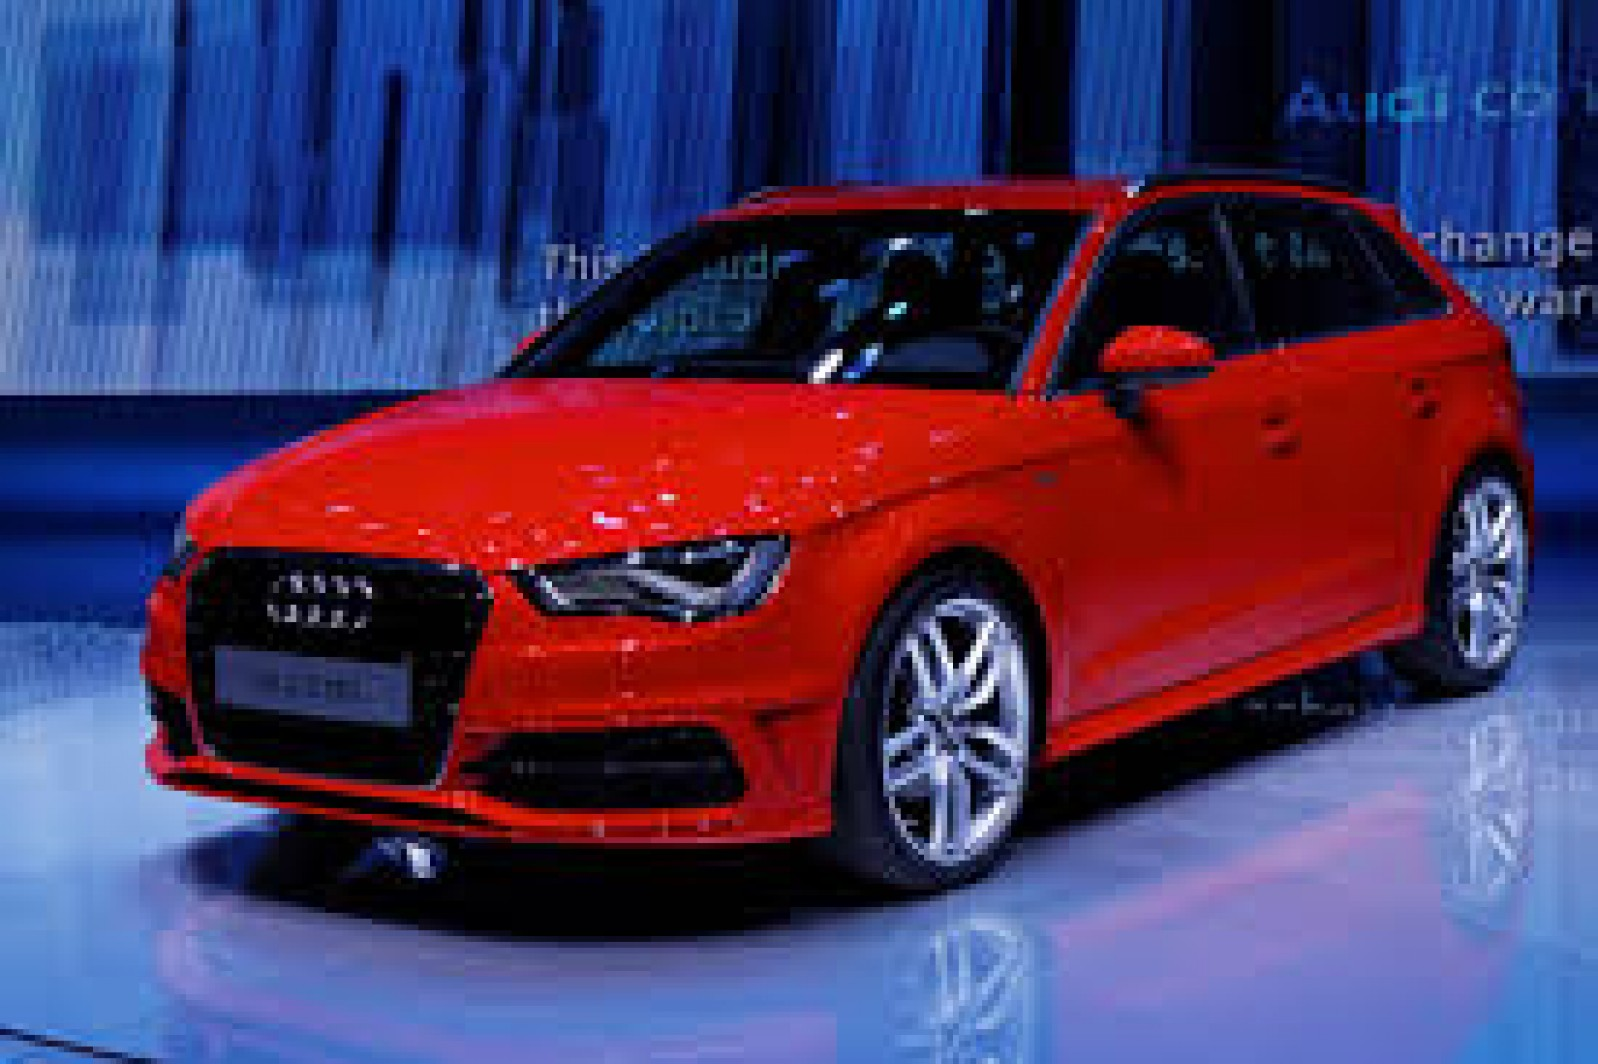 Audi A3 (3e Generation)